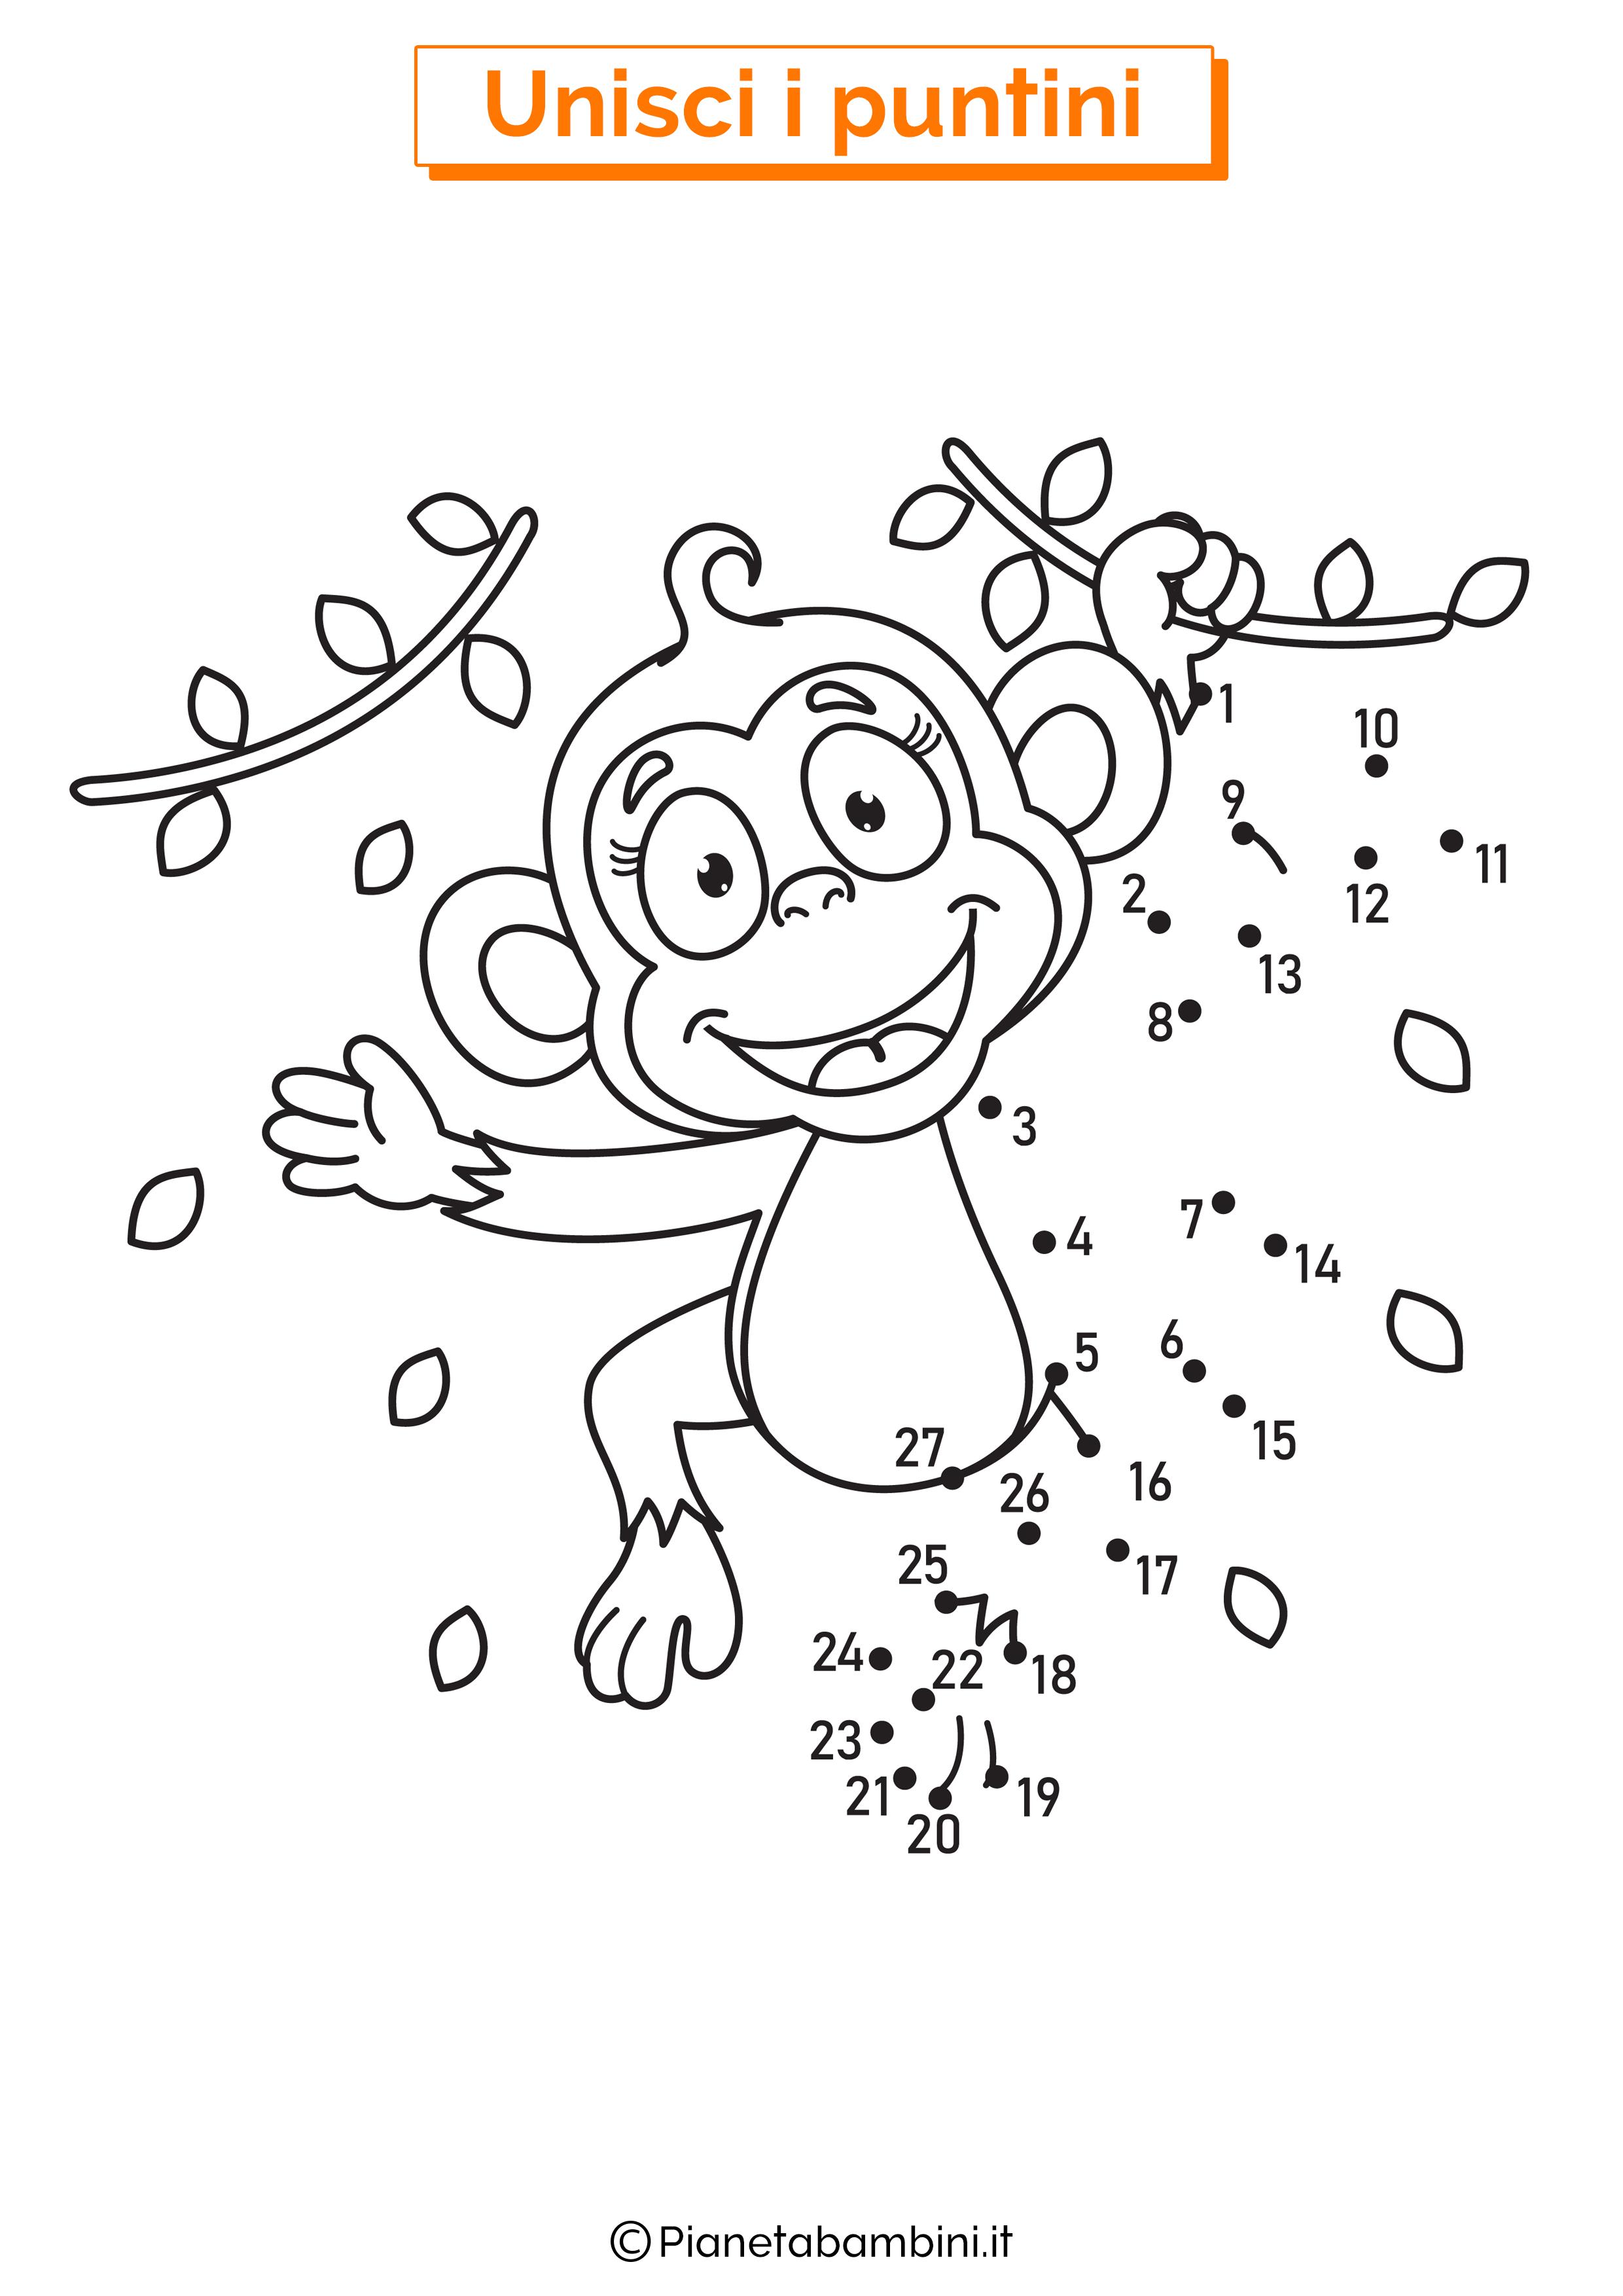 Disegno unisci i puntini scimmia